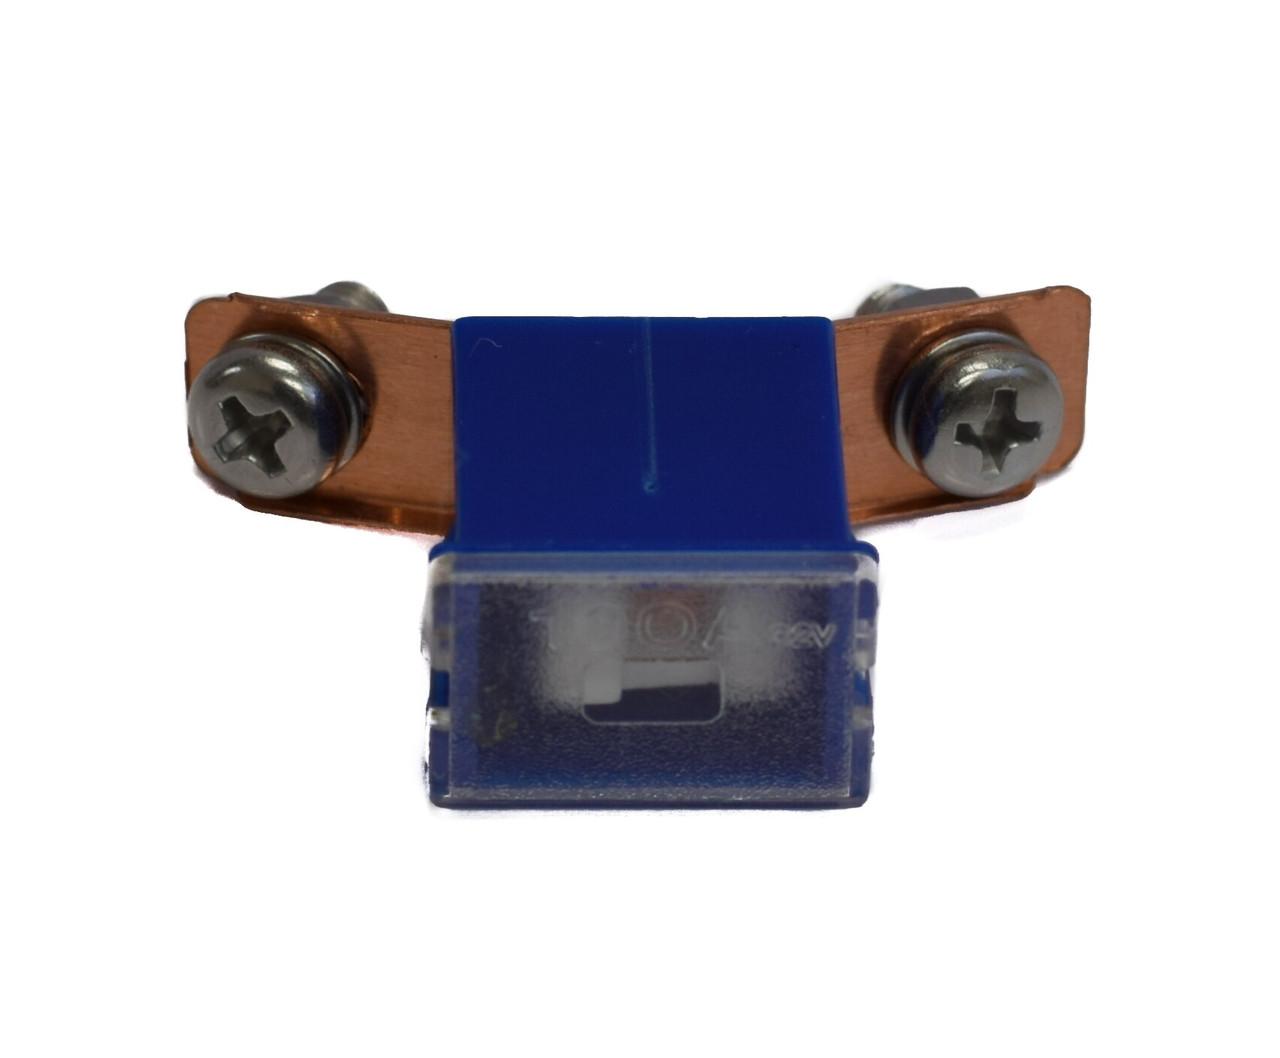 Raion Power RBC7 100A Fuse Includes Nuts & Bolts For APC SmartUPS 1000XL